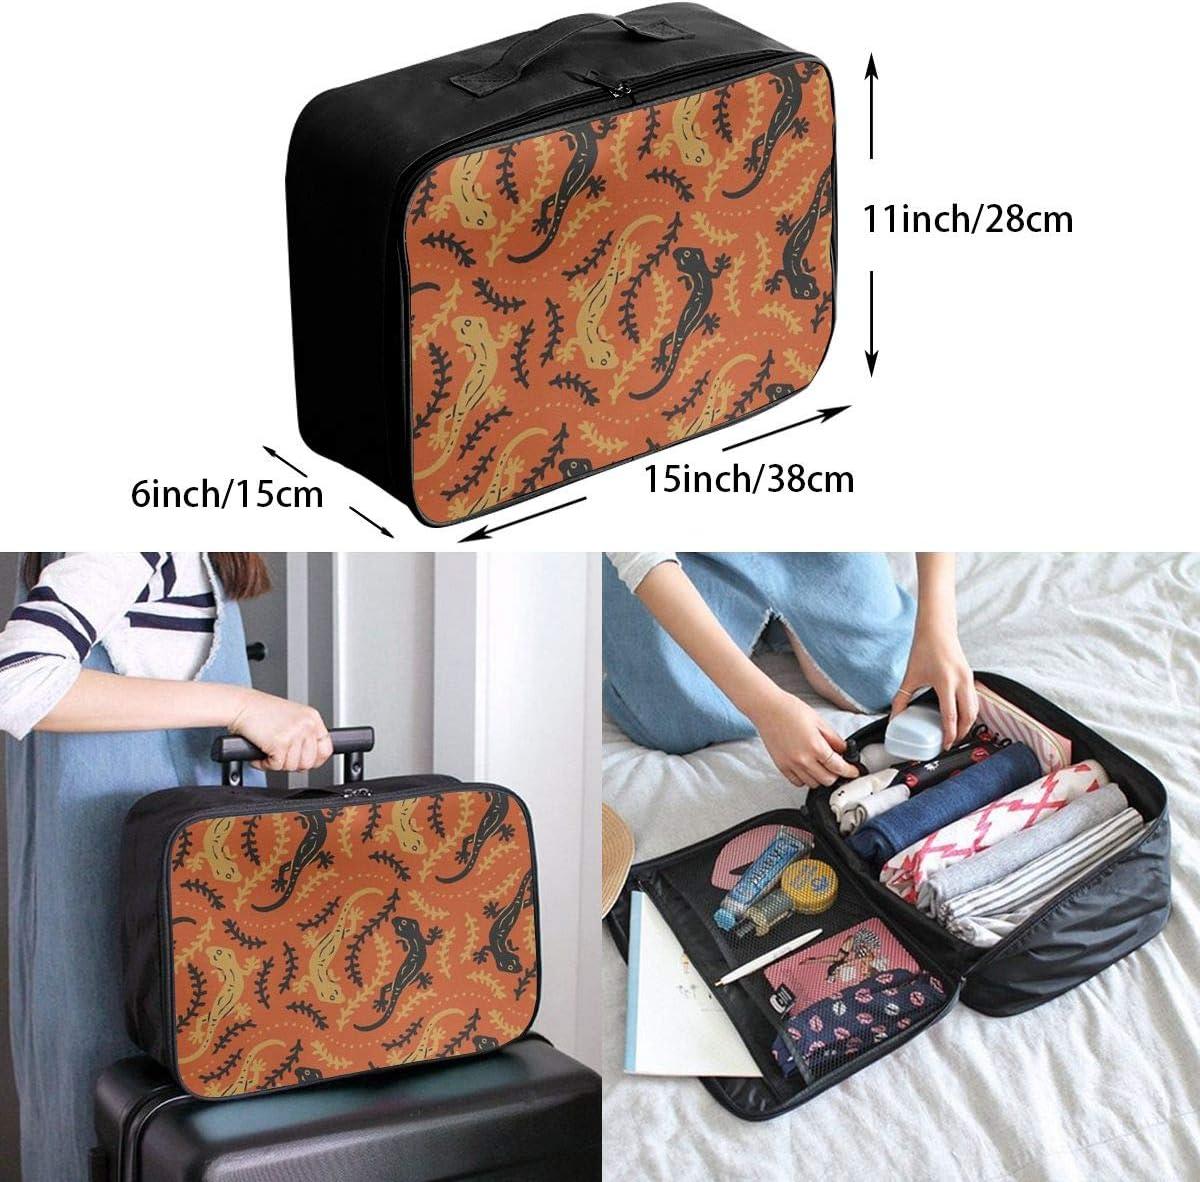 House Lizard Travel Carry-on Luggage Weekender Bag Overnight Tote Flight Duffel In Trolley Handle